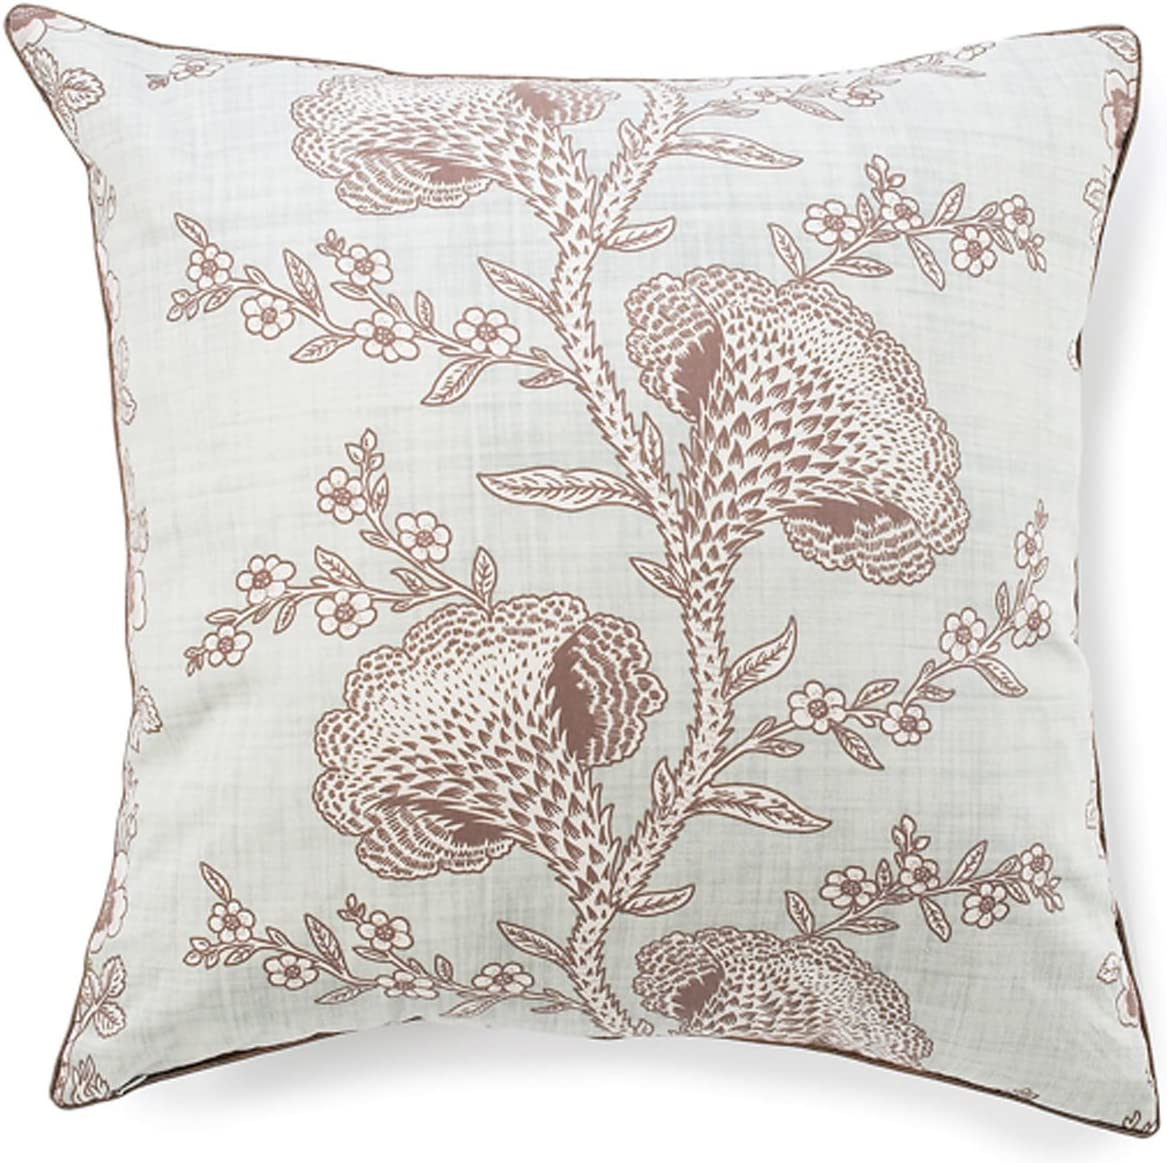 Jiti Geisha Throw Pillow, Cotton, 24-Inch Square, Powder Blue